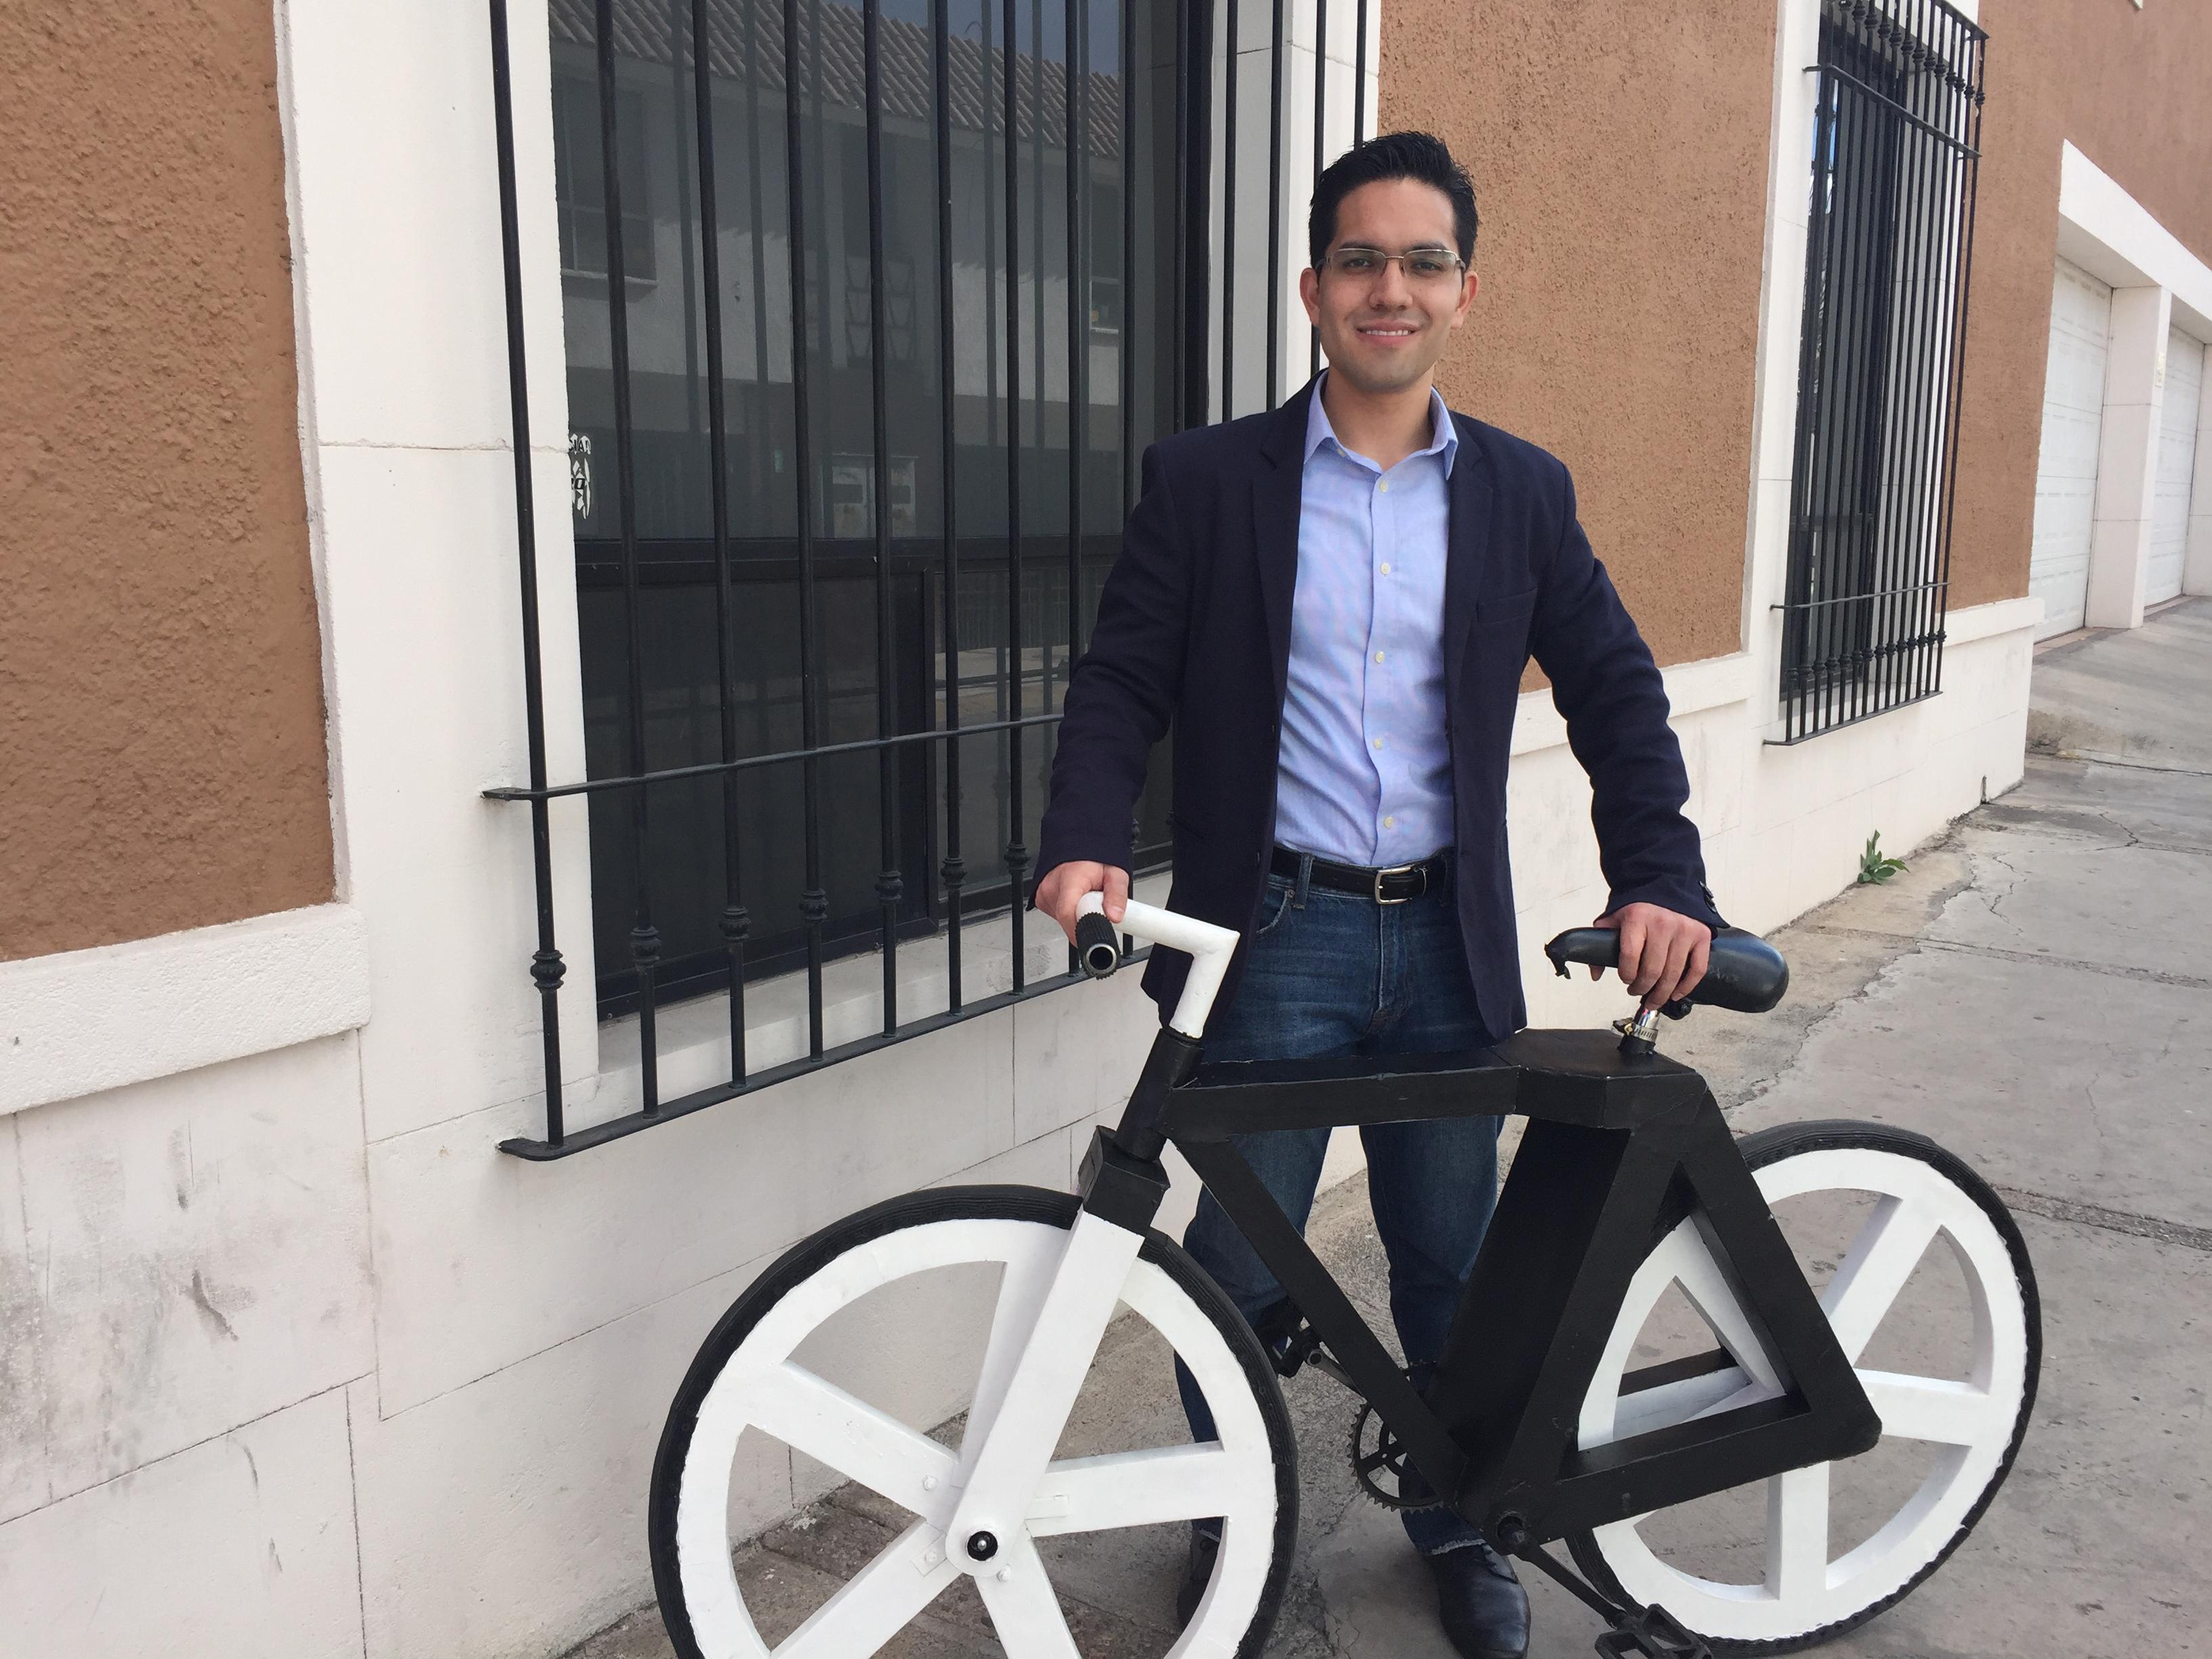 Maneja esta bicicleta hecha de papel | Publimetro